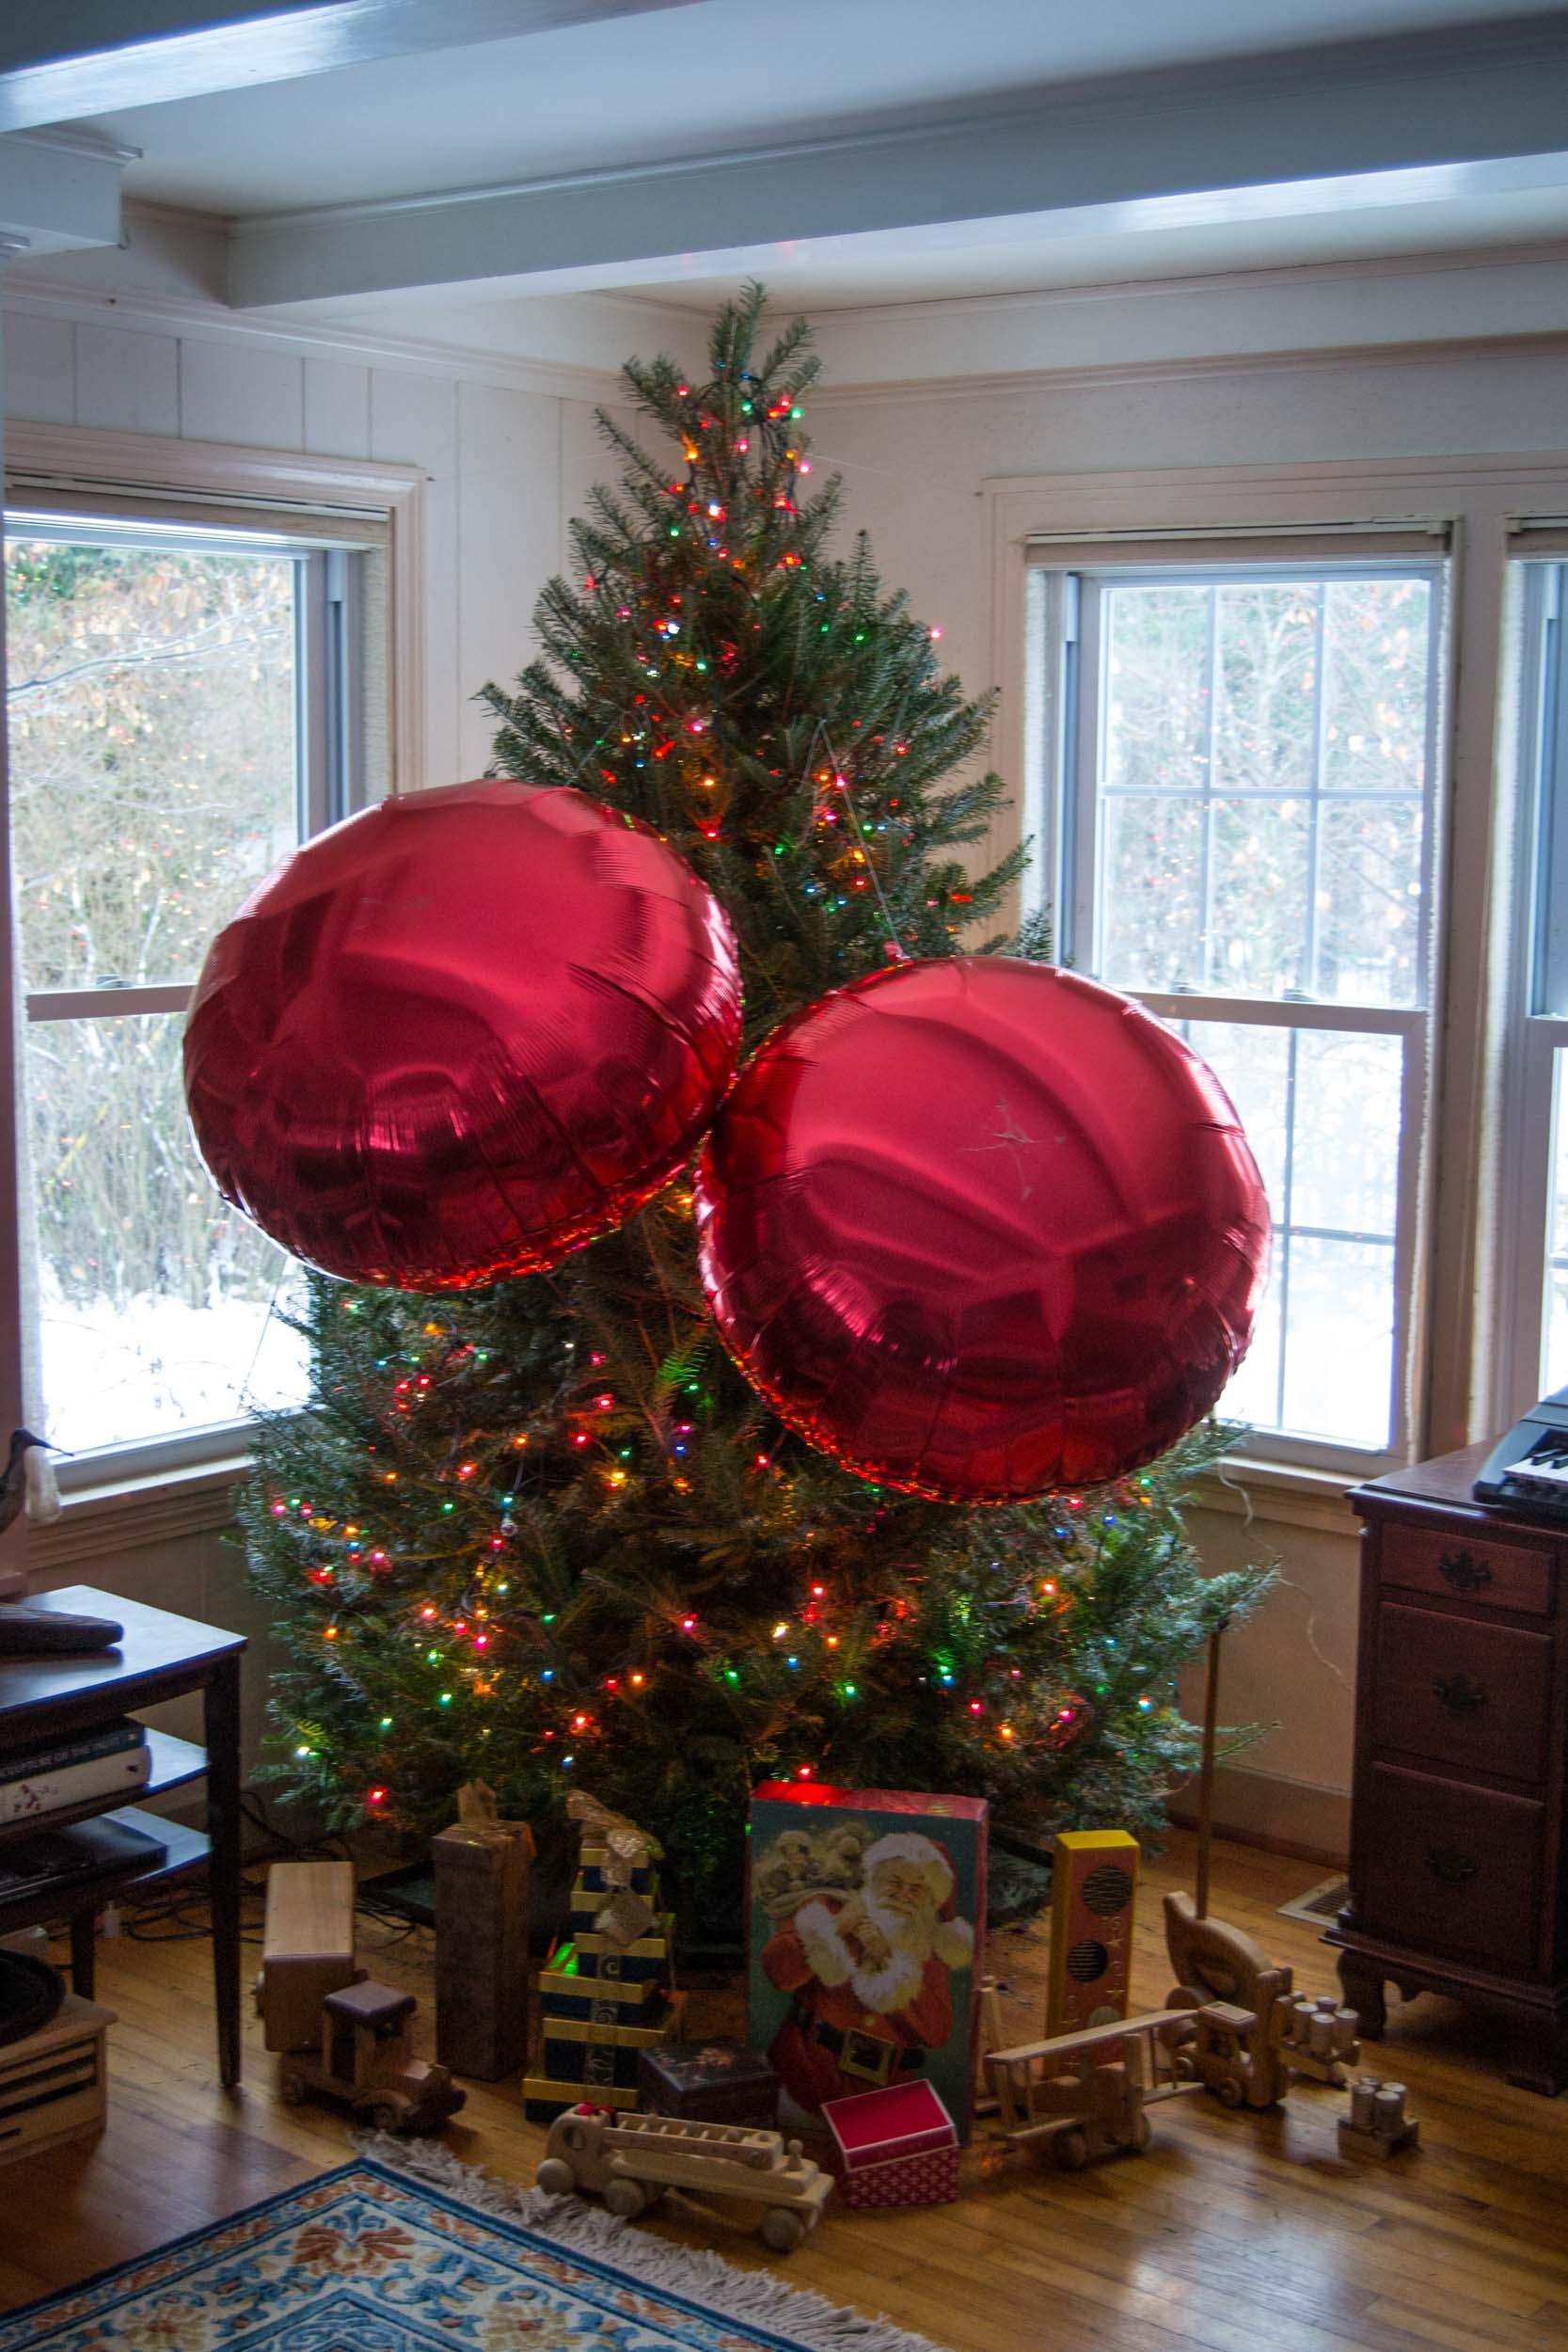 Public Lab: Public Lab's Big Red Christmas Balls